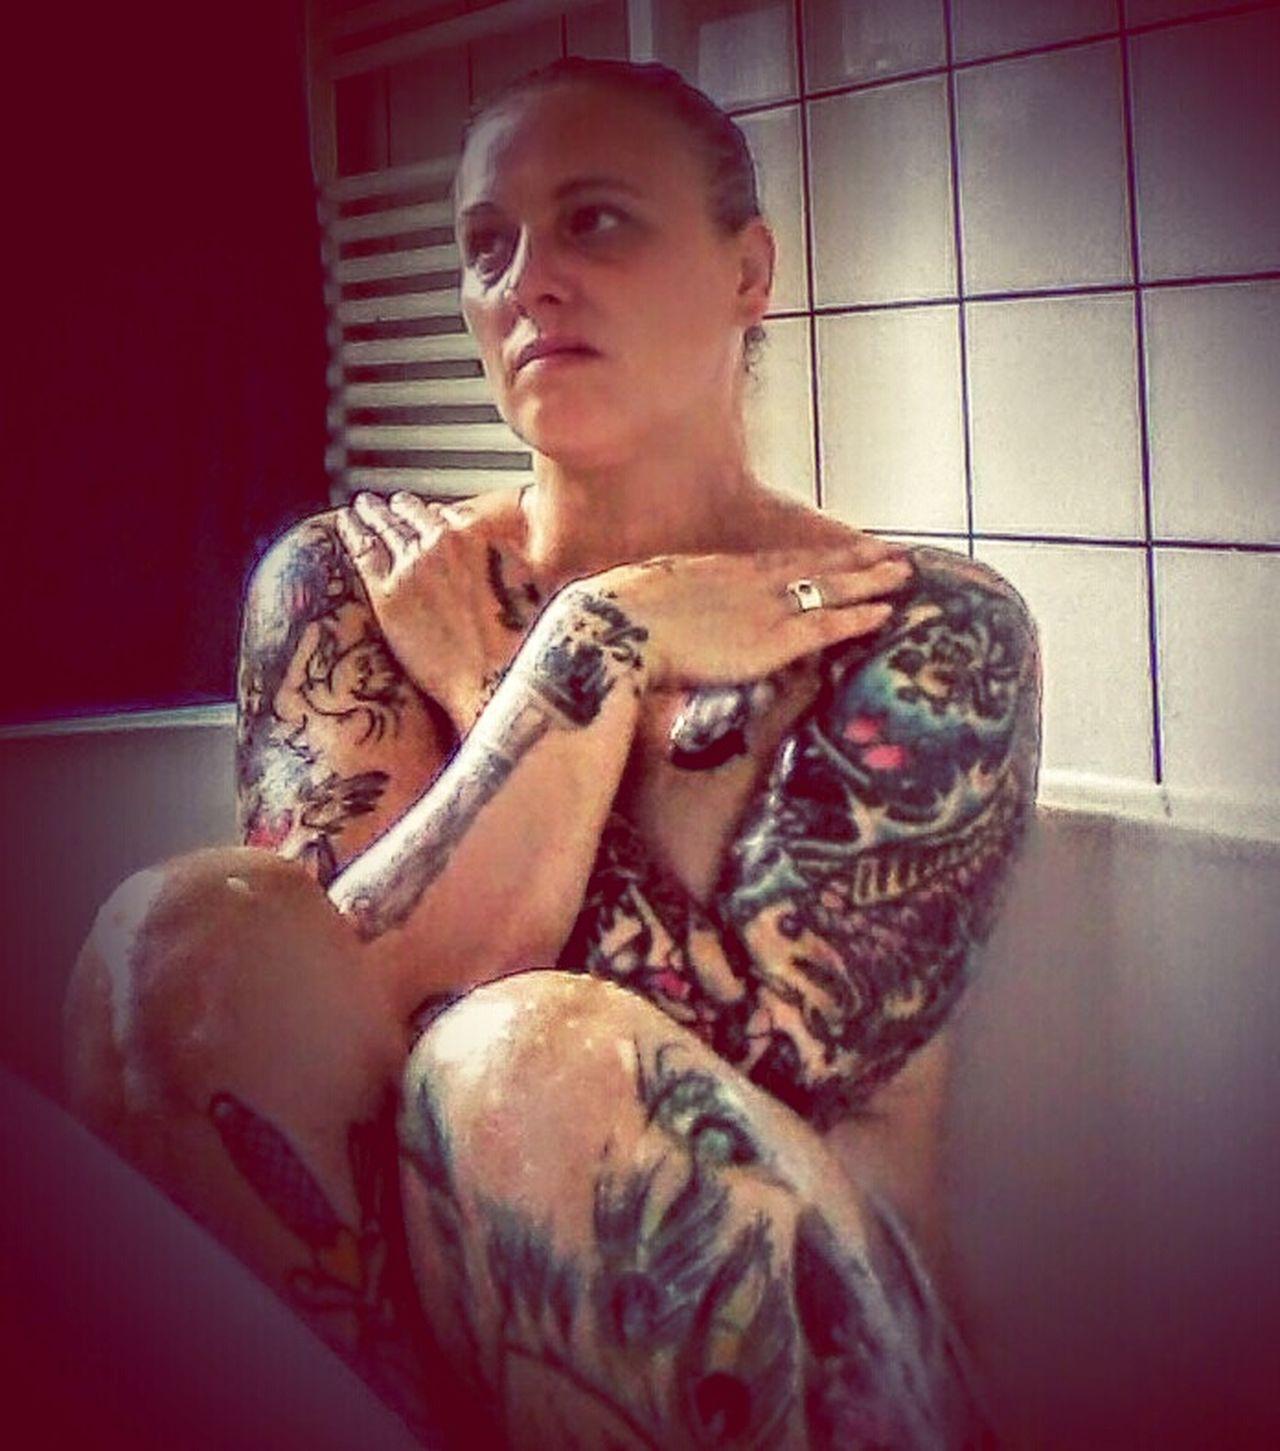 Samsungphotography Tattoos Tattedgirls Inkaddiction Bath Athome  Inkedgirls INKEDGIRL Inkstagram Tattoo